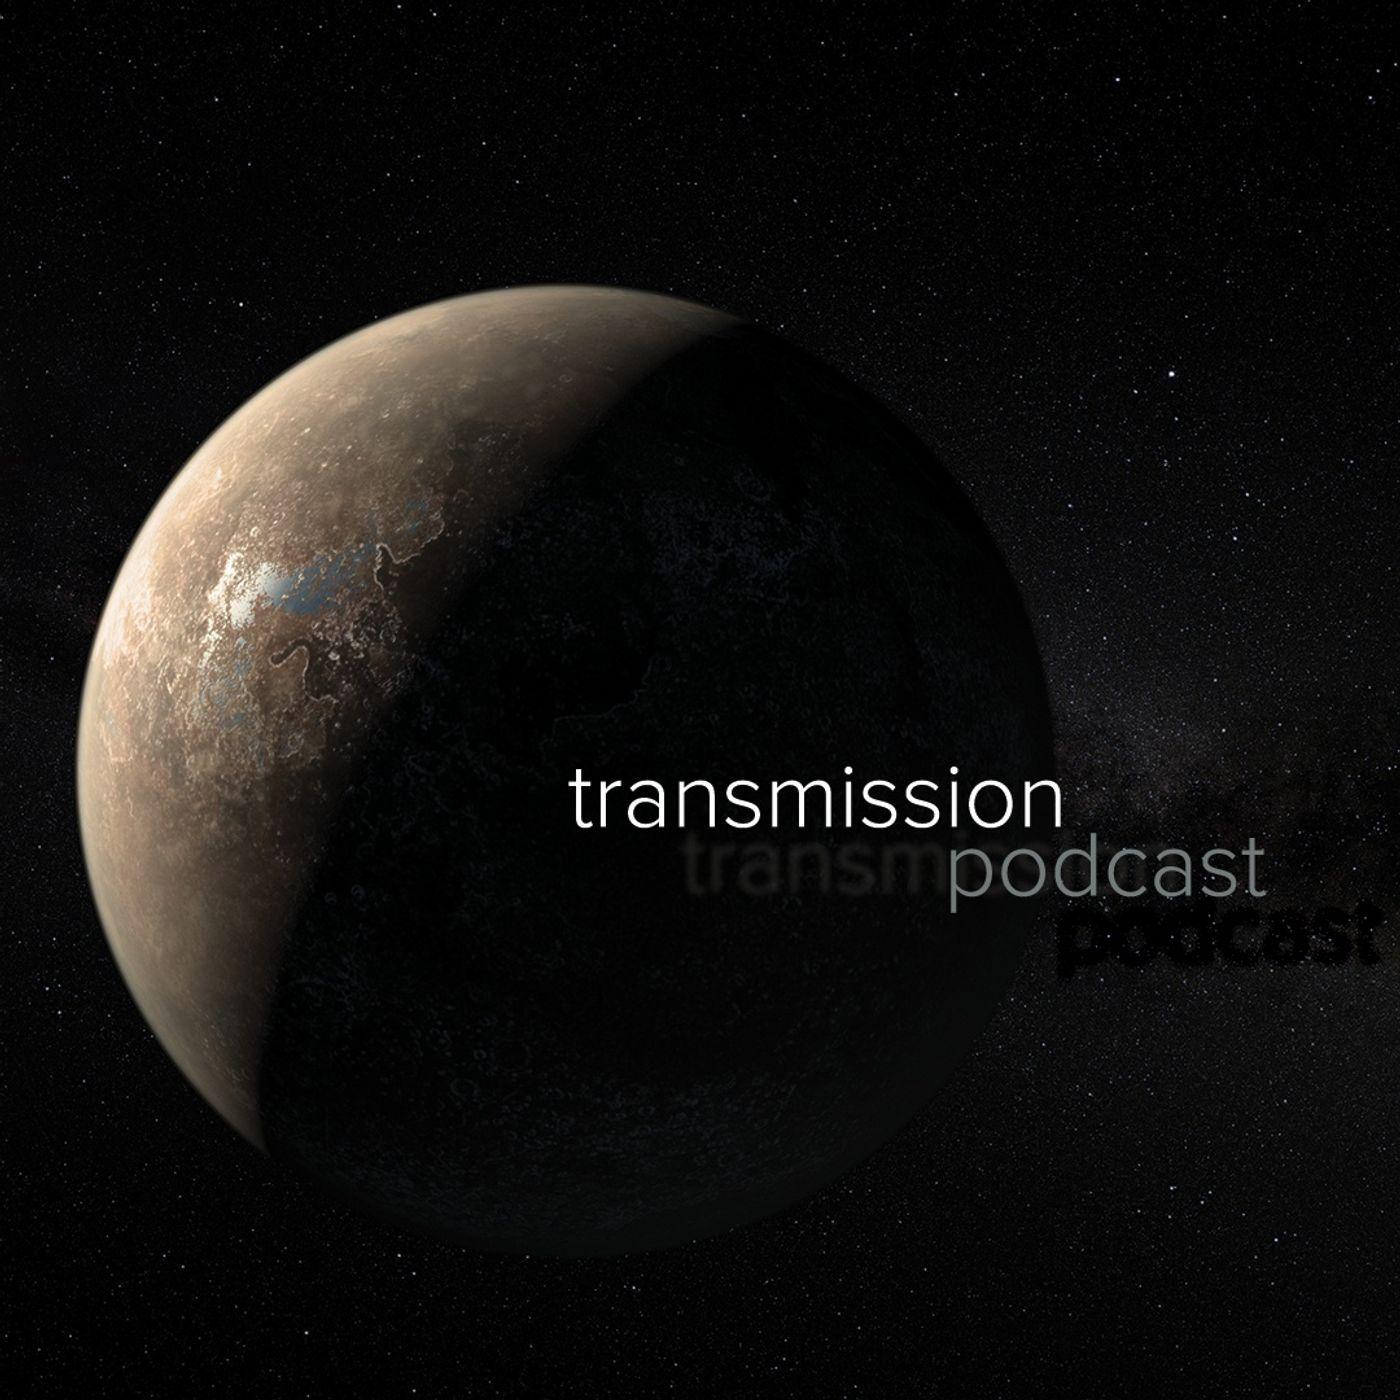 Transmission Podcast